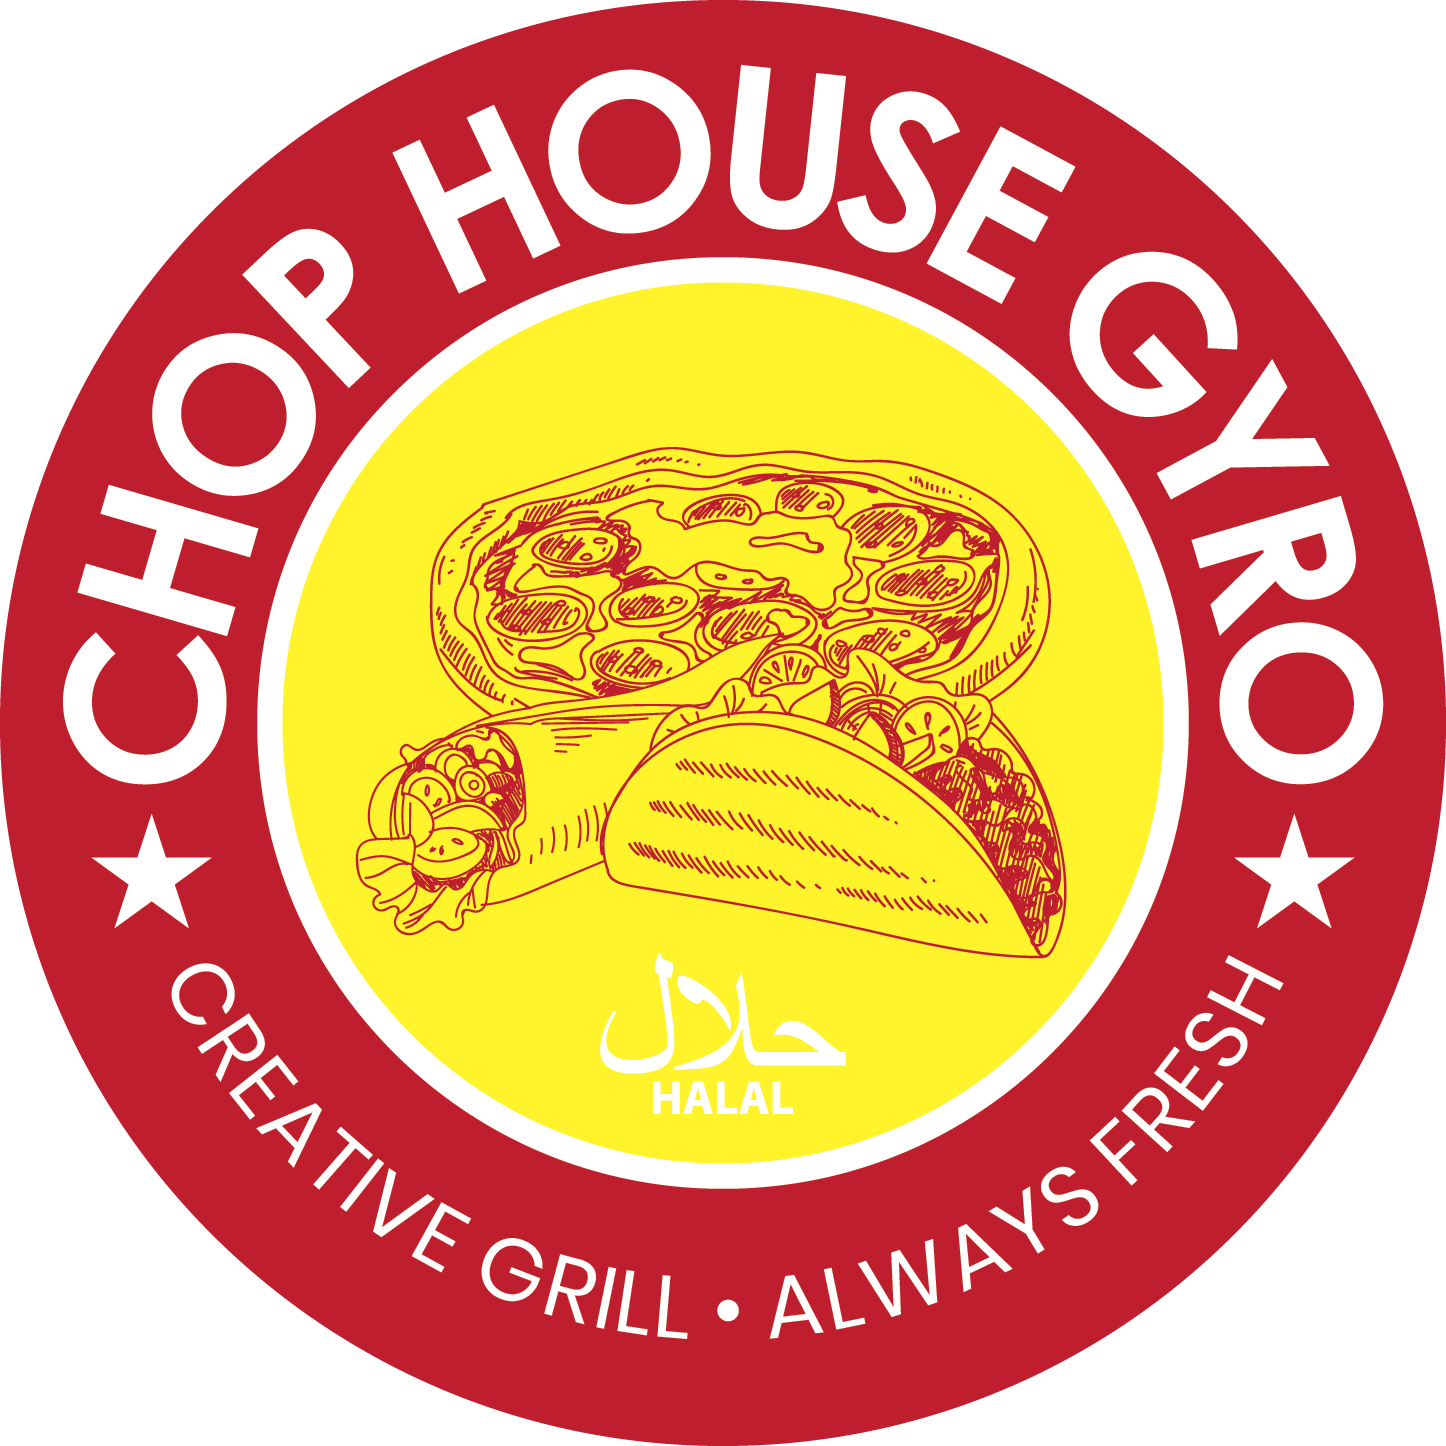 Chop House Gyro